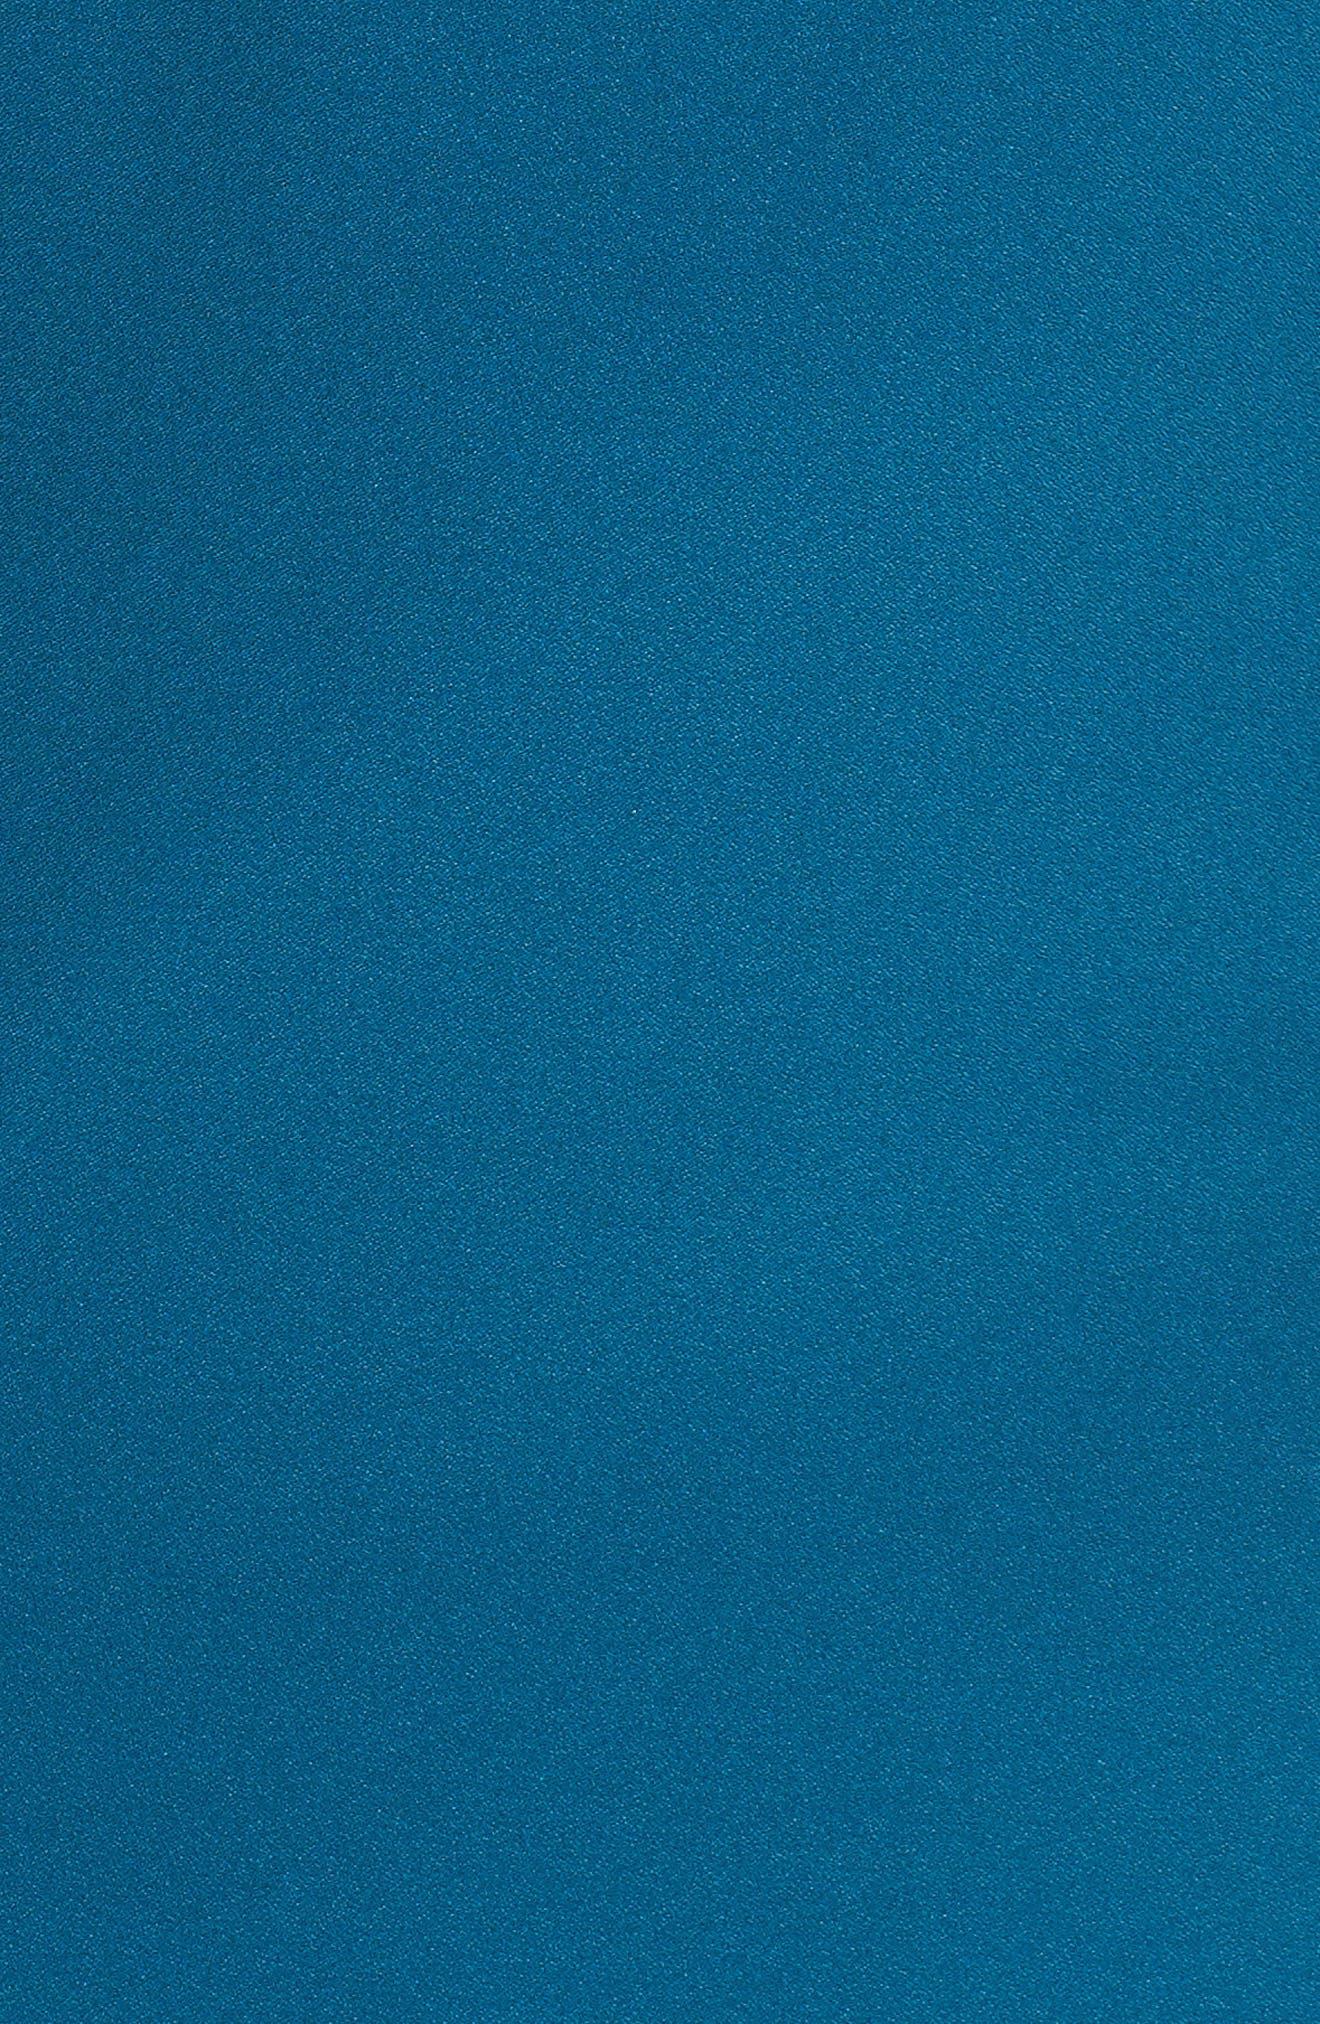 Long Split Sleeve Crepe Sheath Dress,                             Alternate thumbnail 6, color,                             OCEAN TEAL